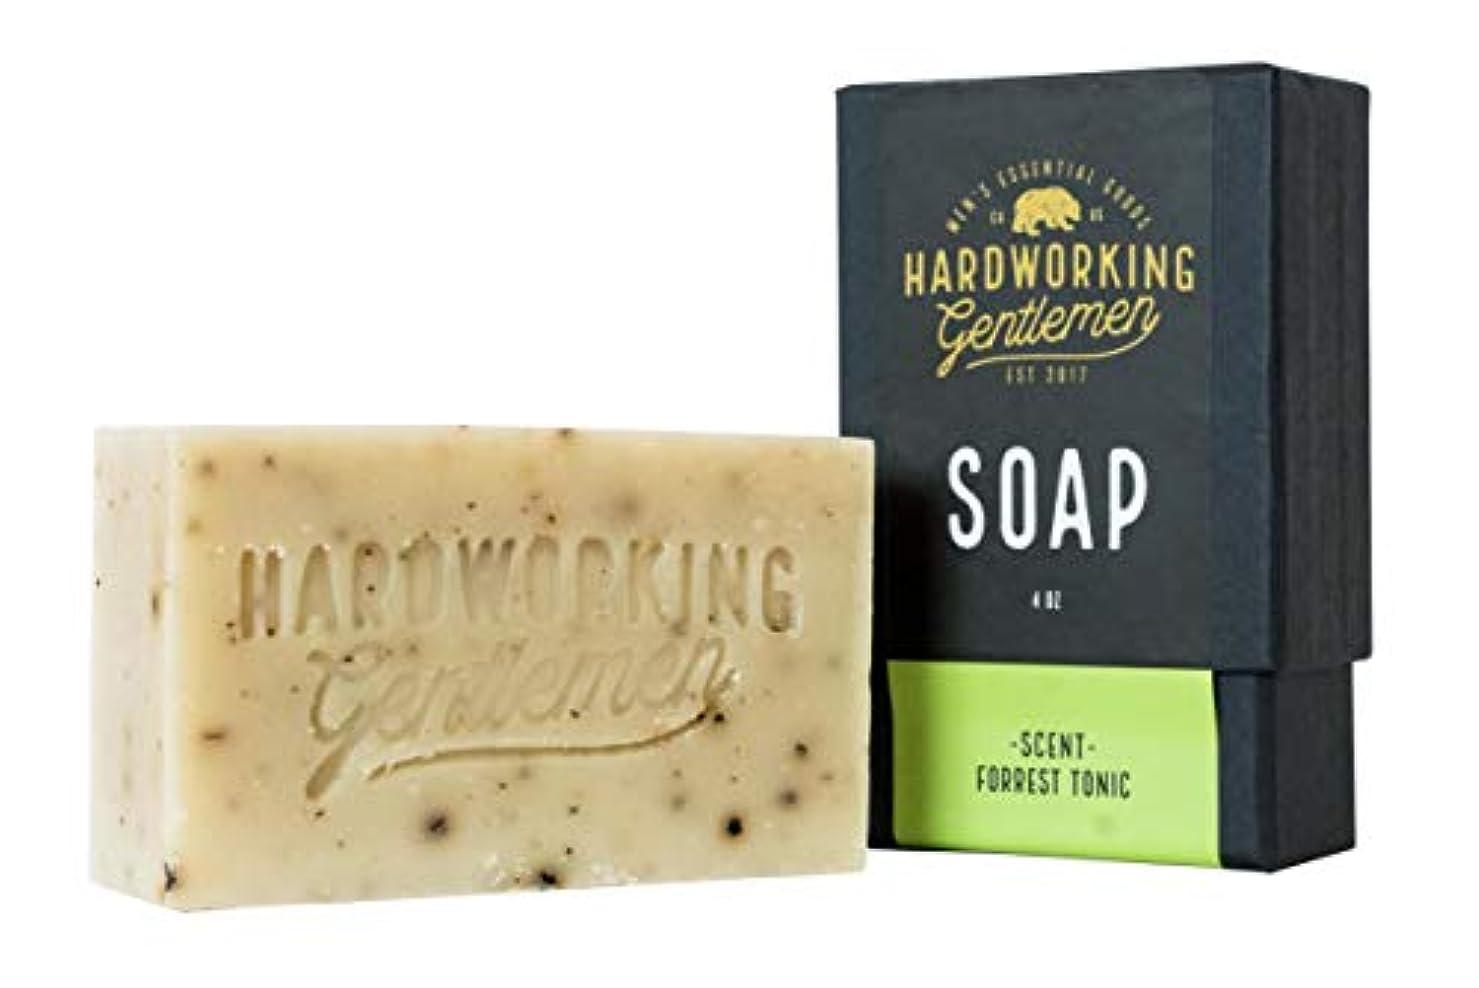 Hardworking Gentlemen (ハードワーキング ジェントルメン) Forest Tonic Soap バーソープ 固形せっけん 113g 天然成分 オーガニック